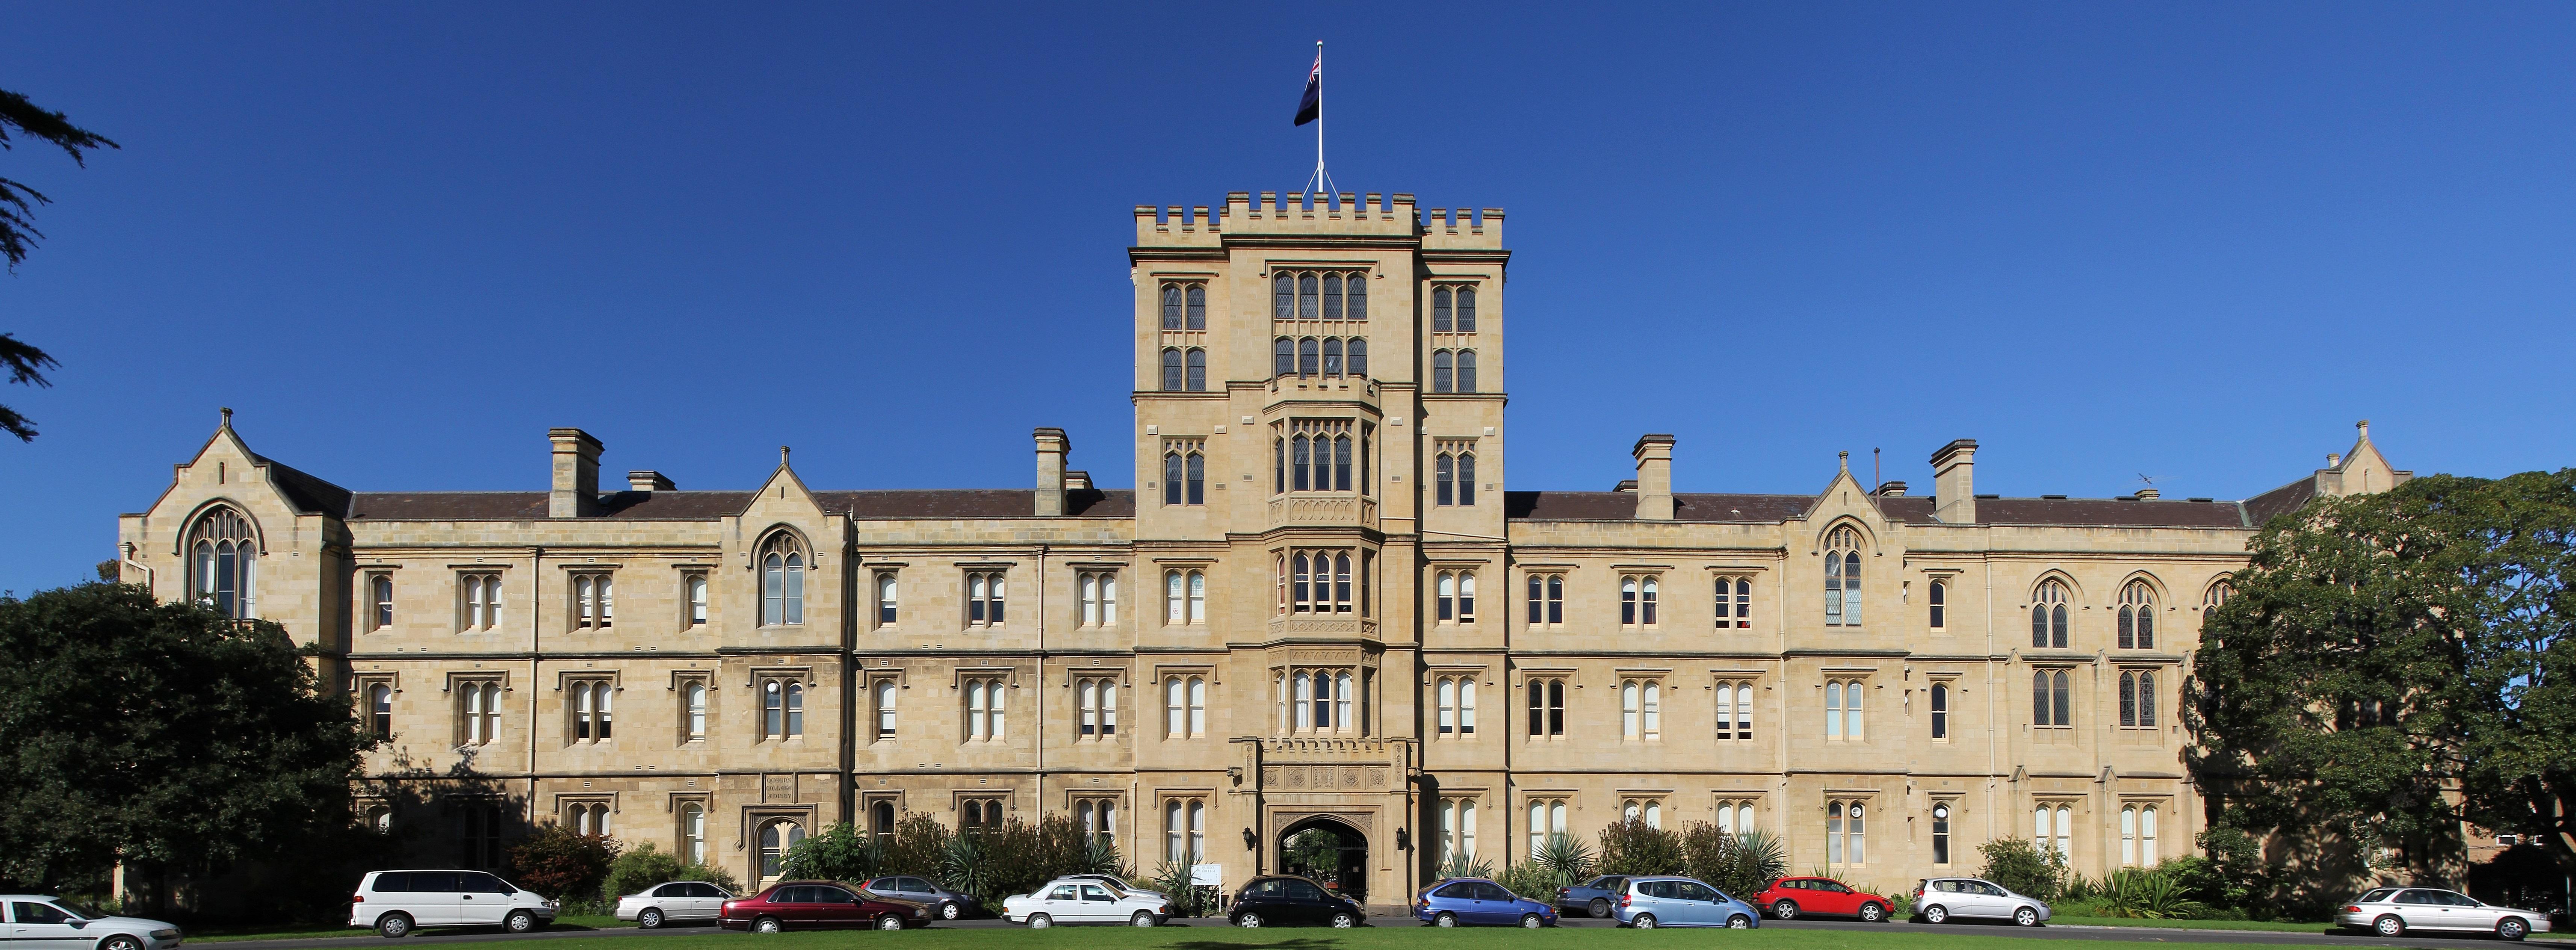 Por dentro da Universidade de Melbourne